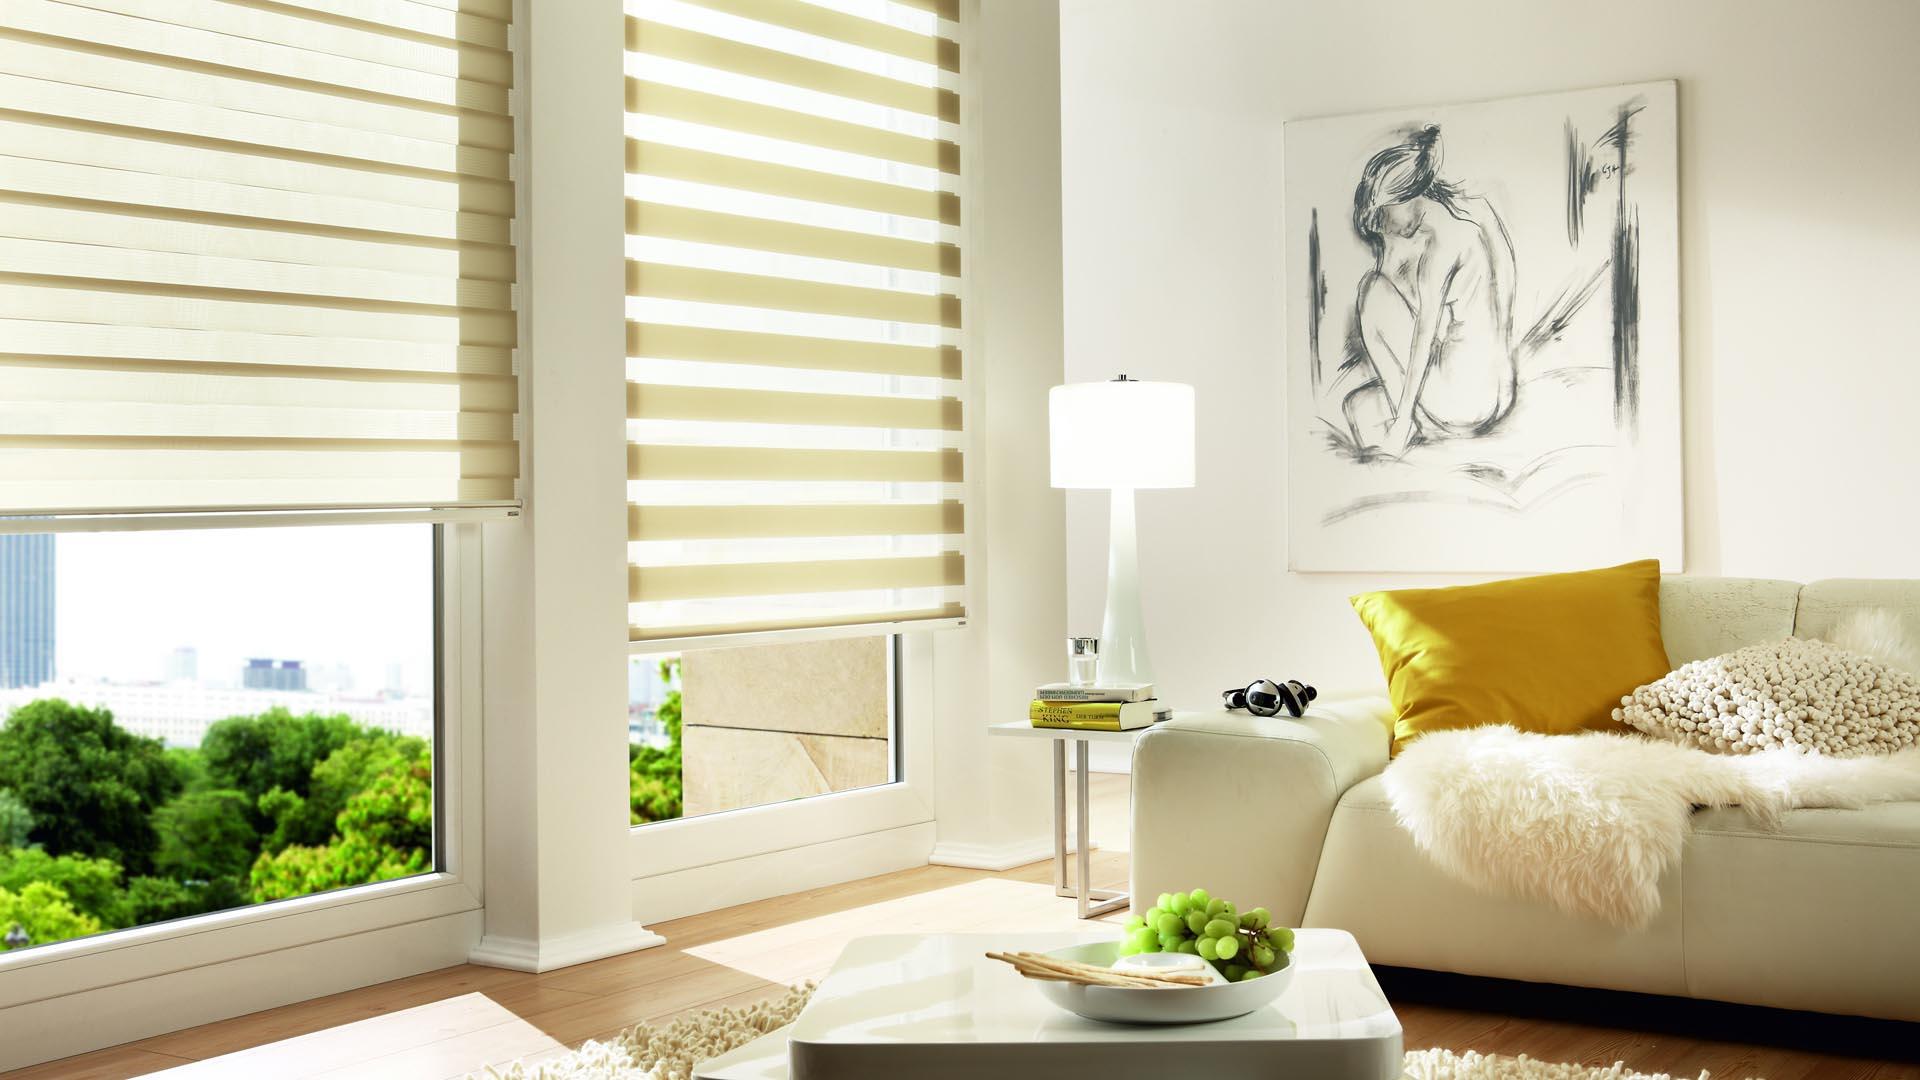 rollo als raumteiler flexibles raumbad mit rollo u auch als raumteiler geeignet with rollo als. Black Bedroom Furniture Sets. Home Design Ideas